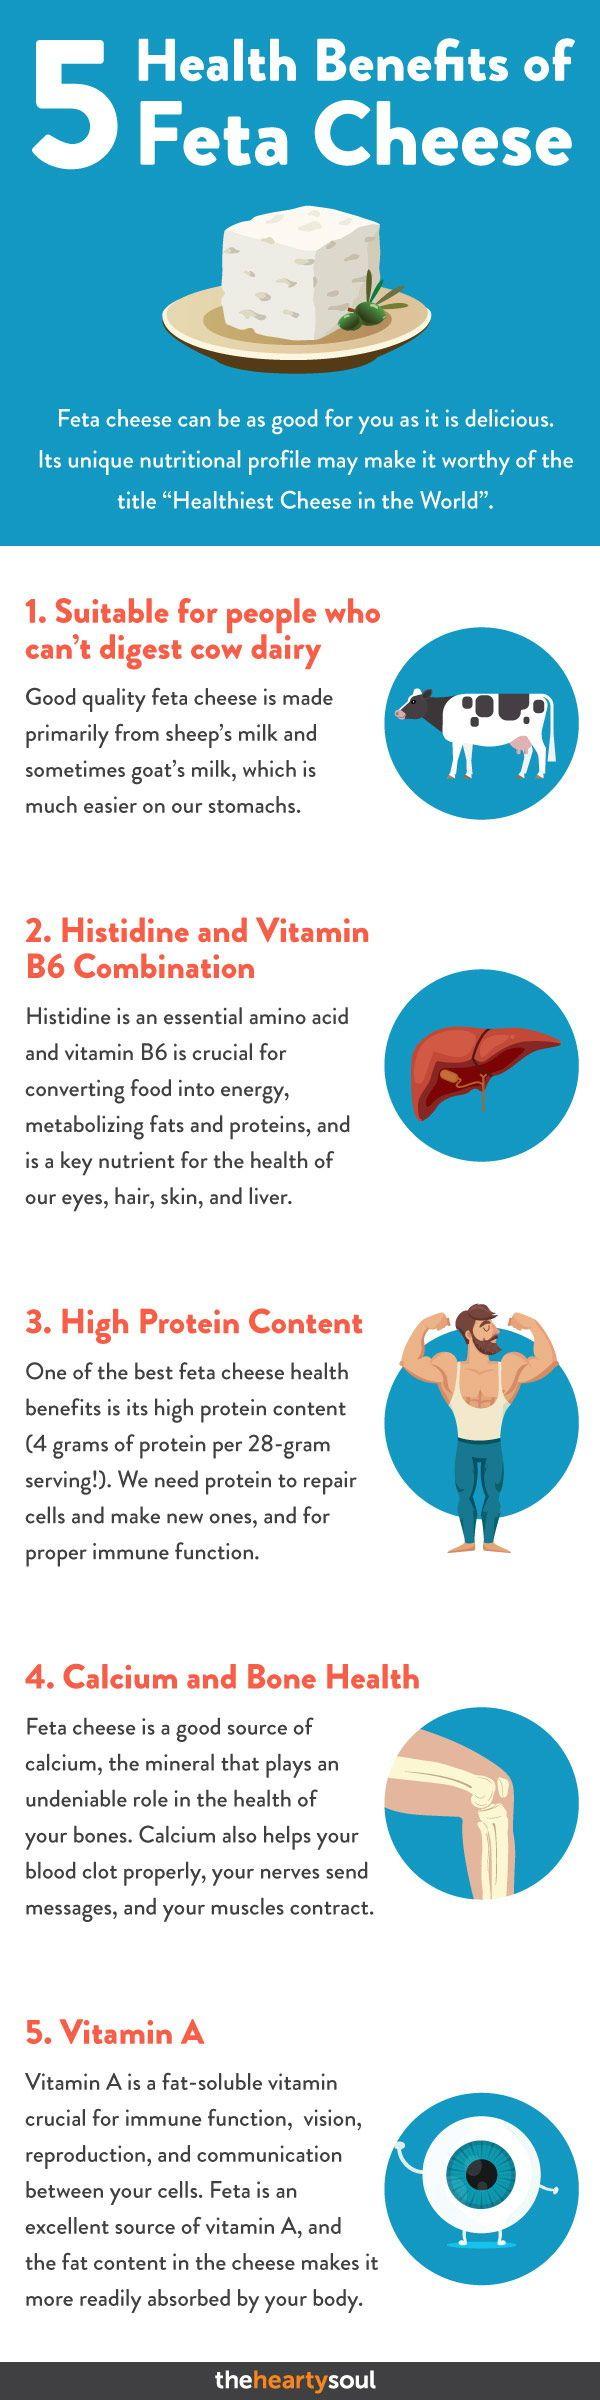 5 Health Benefits of Feta Cheese